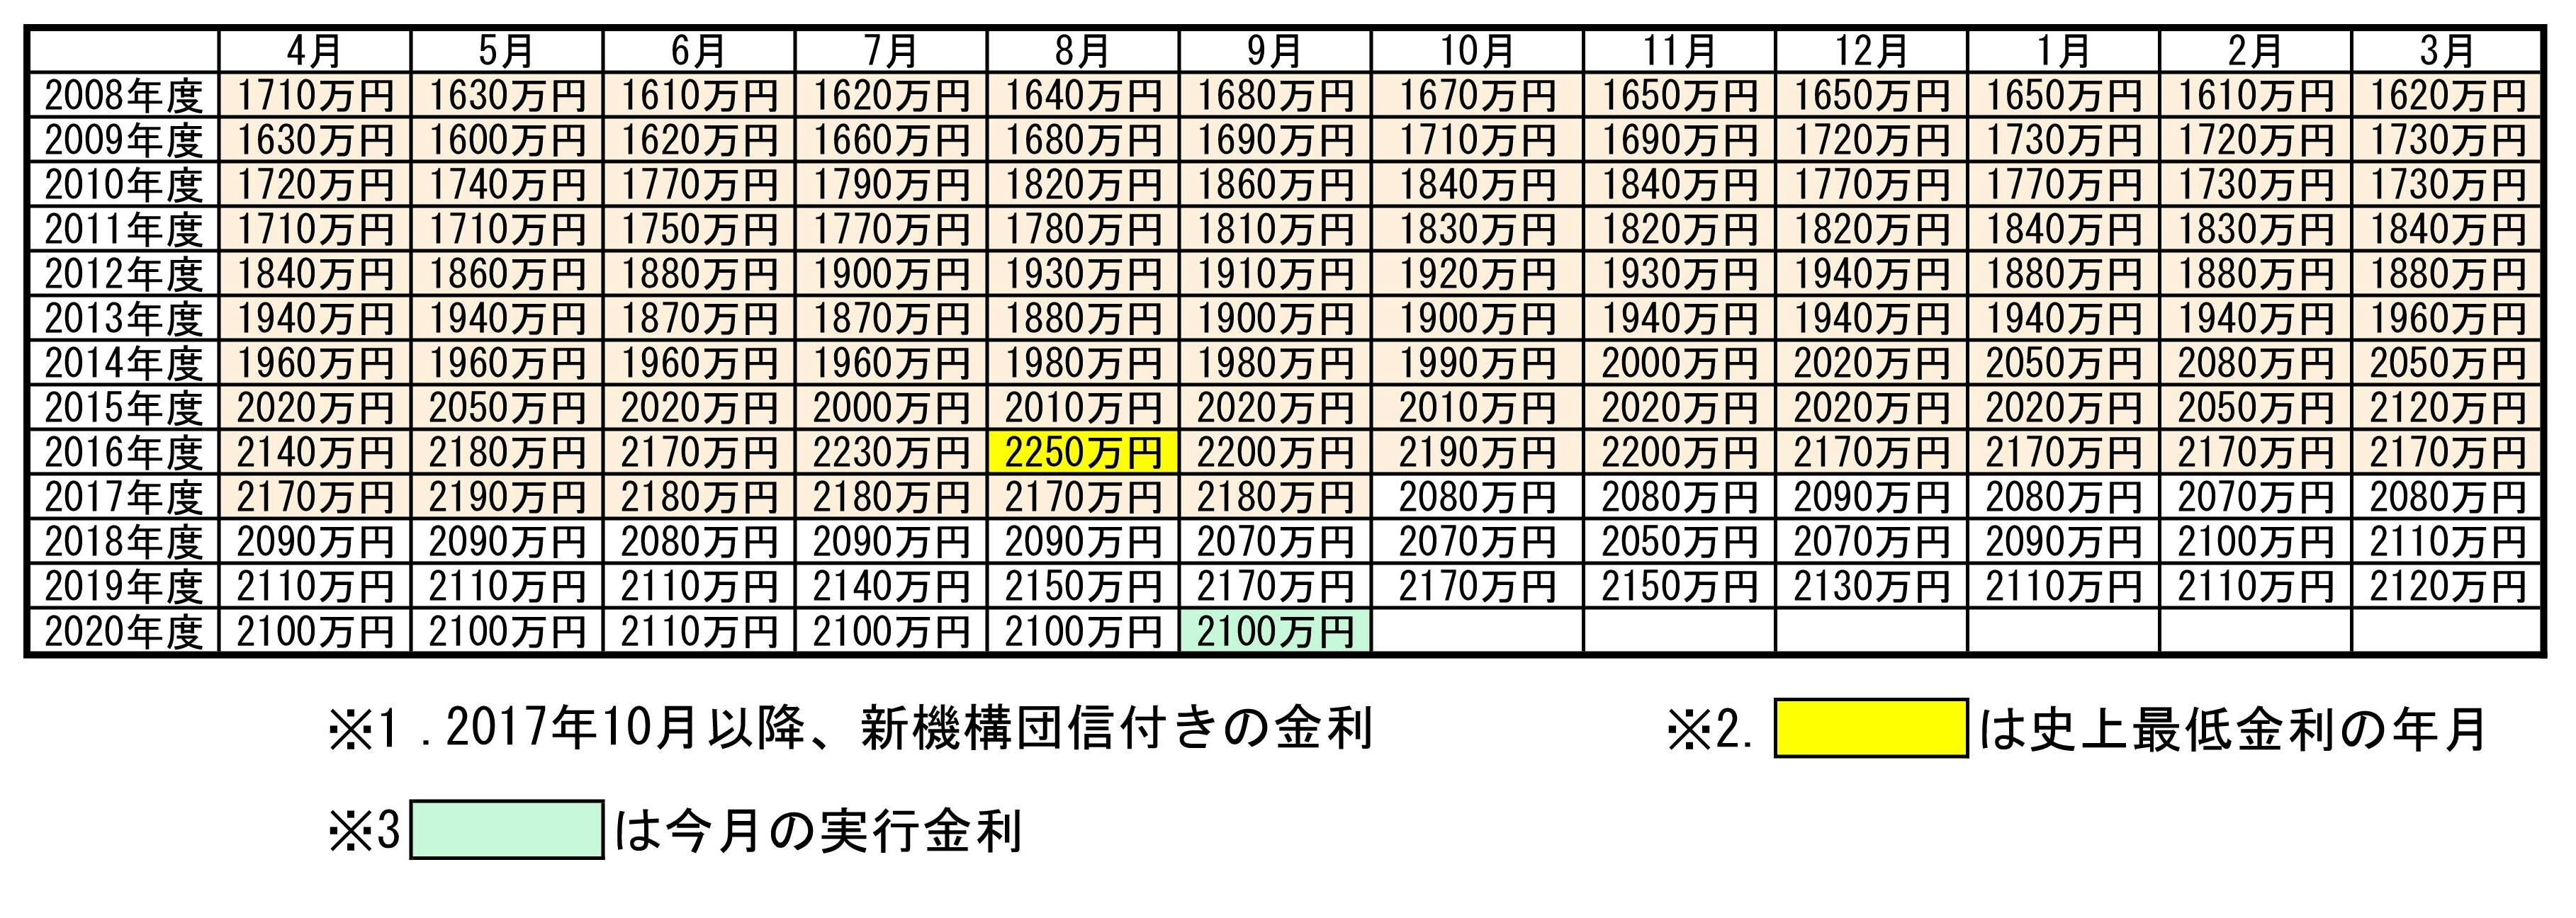 20200901kinri (4).jpg